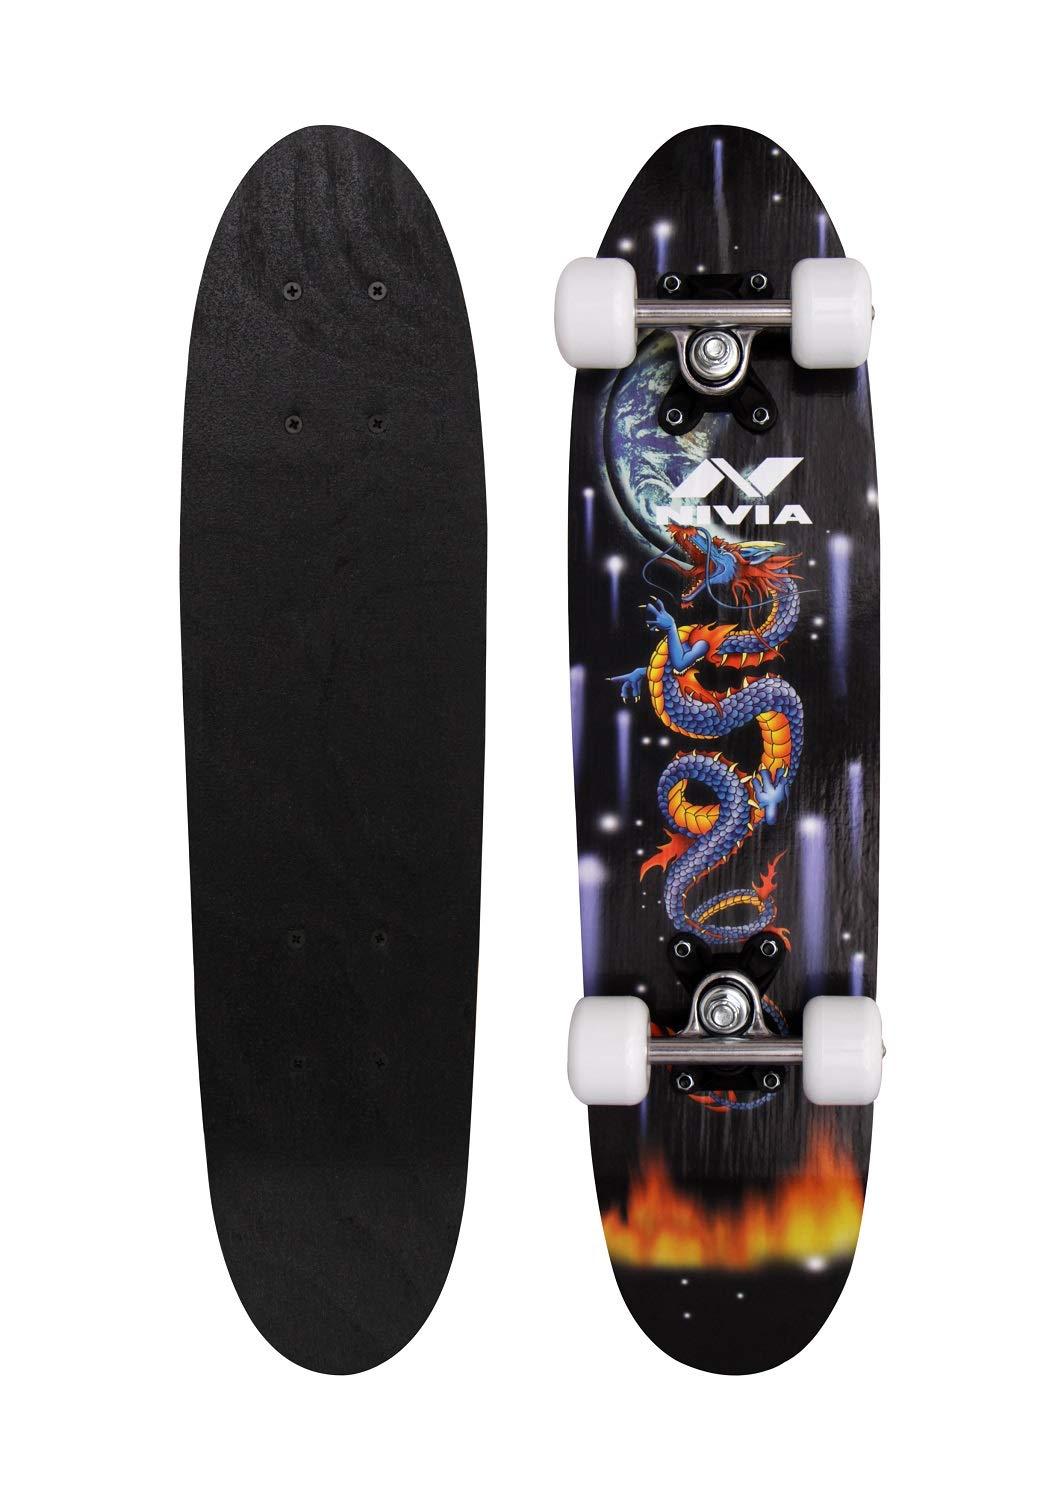 adafc376 Best Rated in Skateboarding & Helpful Customer Reviews - Amazon.in